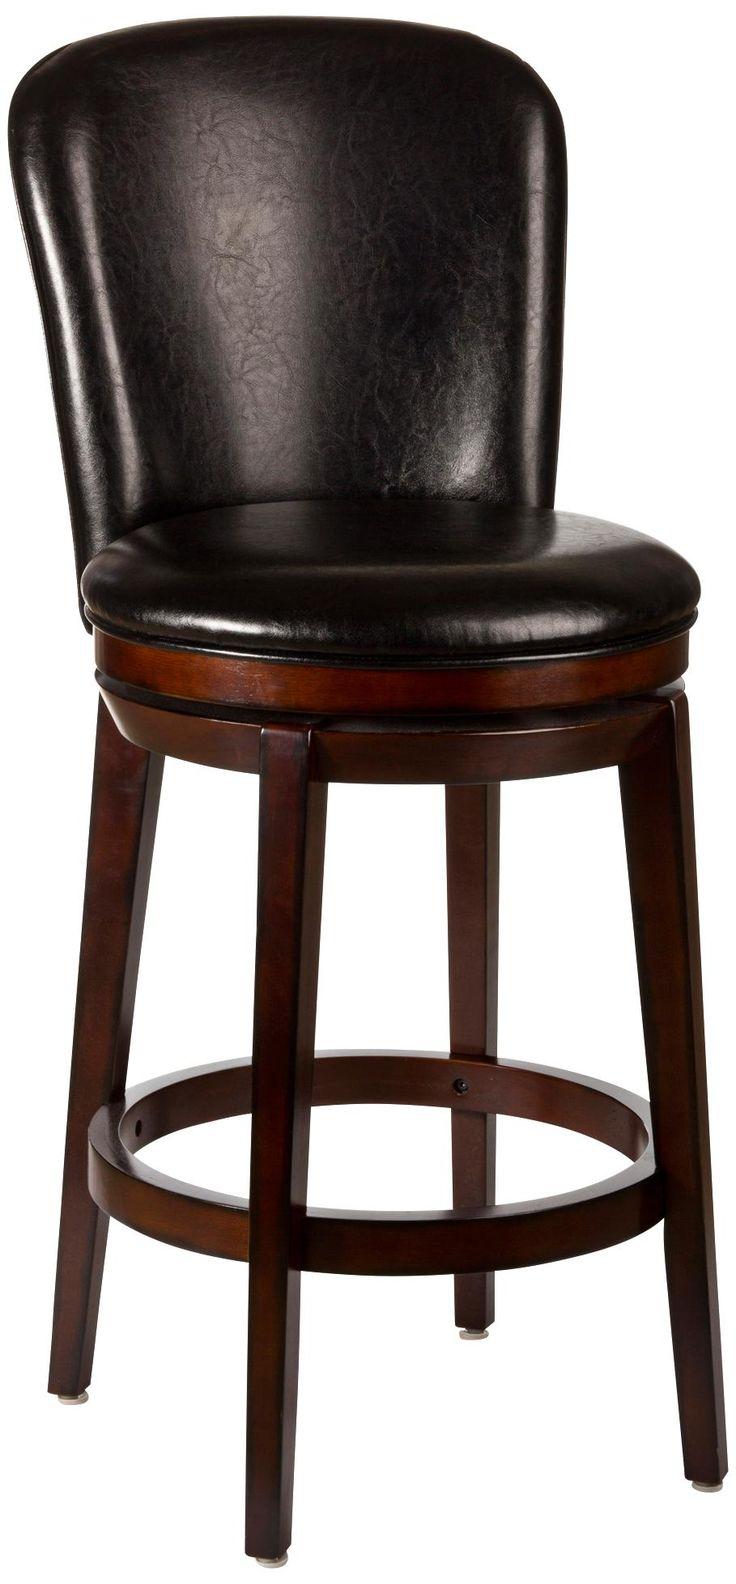 25 best Kitchen Bar Stools images on Pinterest | Swivel bar stools ...